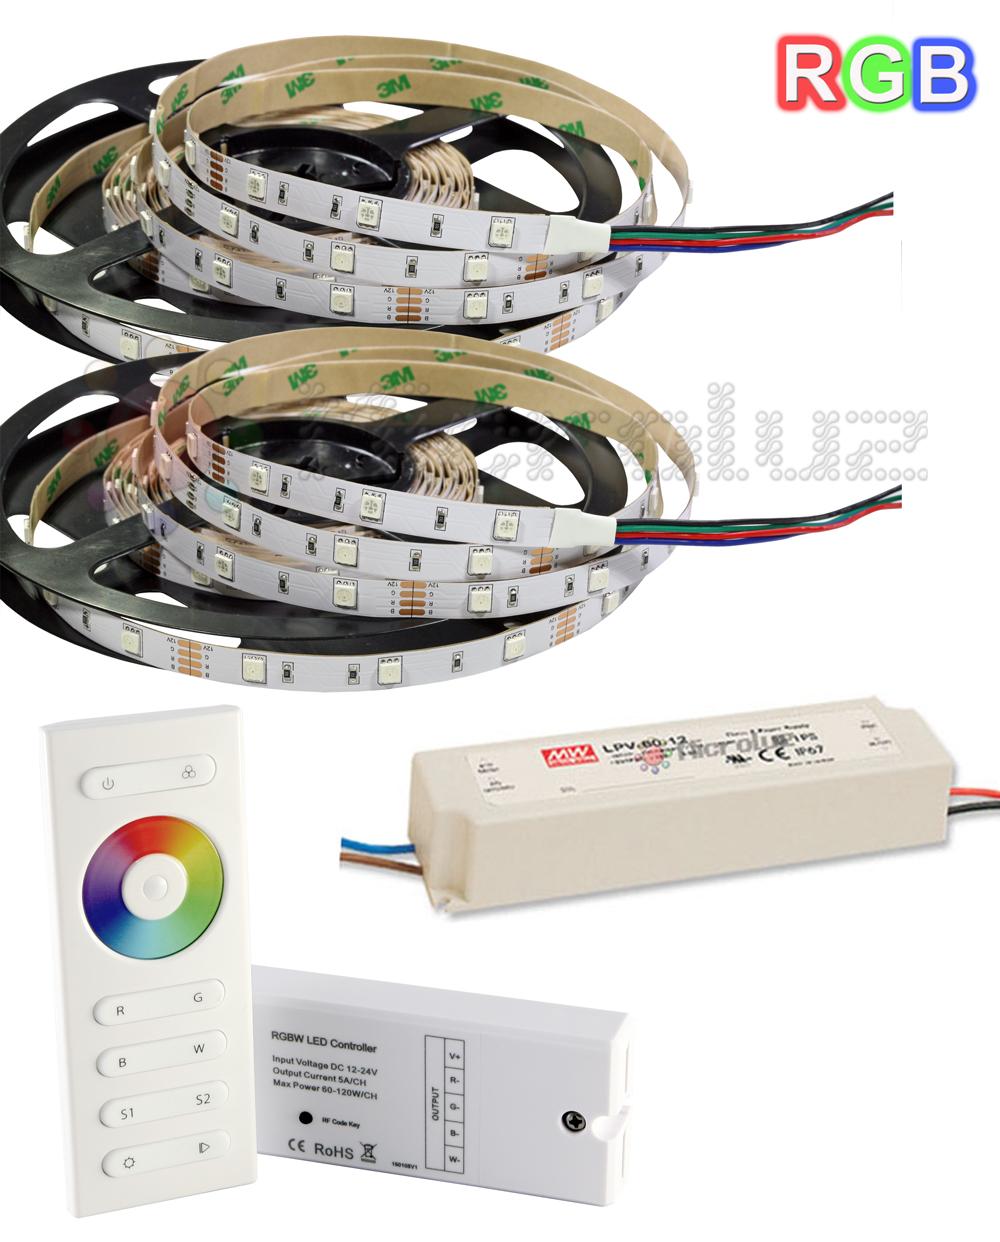 Tira de LED RGB 10 metros + Controlador con mando a distancia + Fuente LED 60W